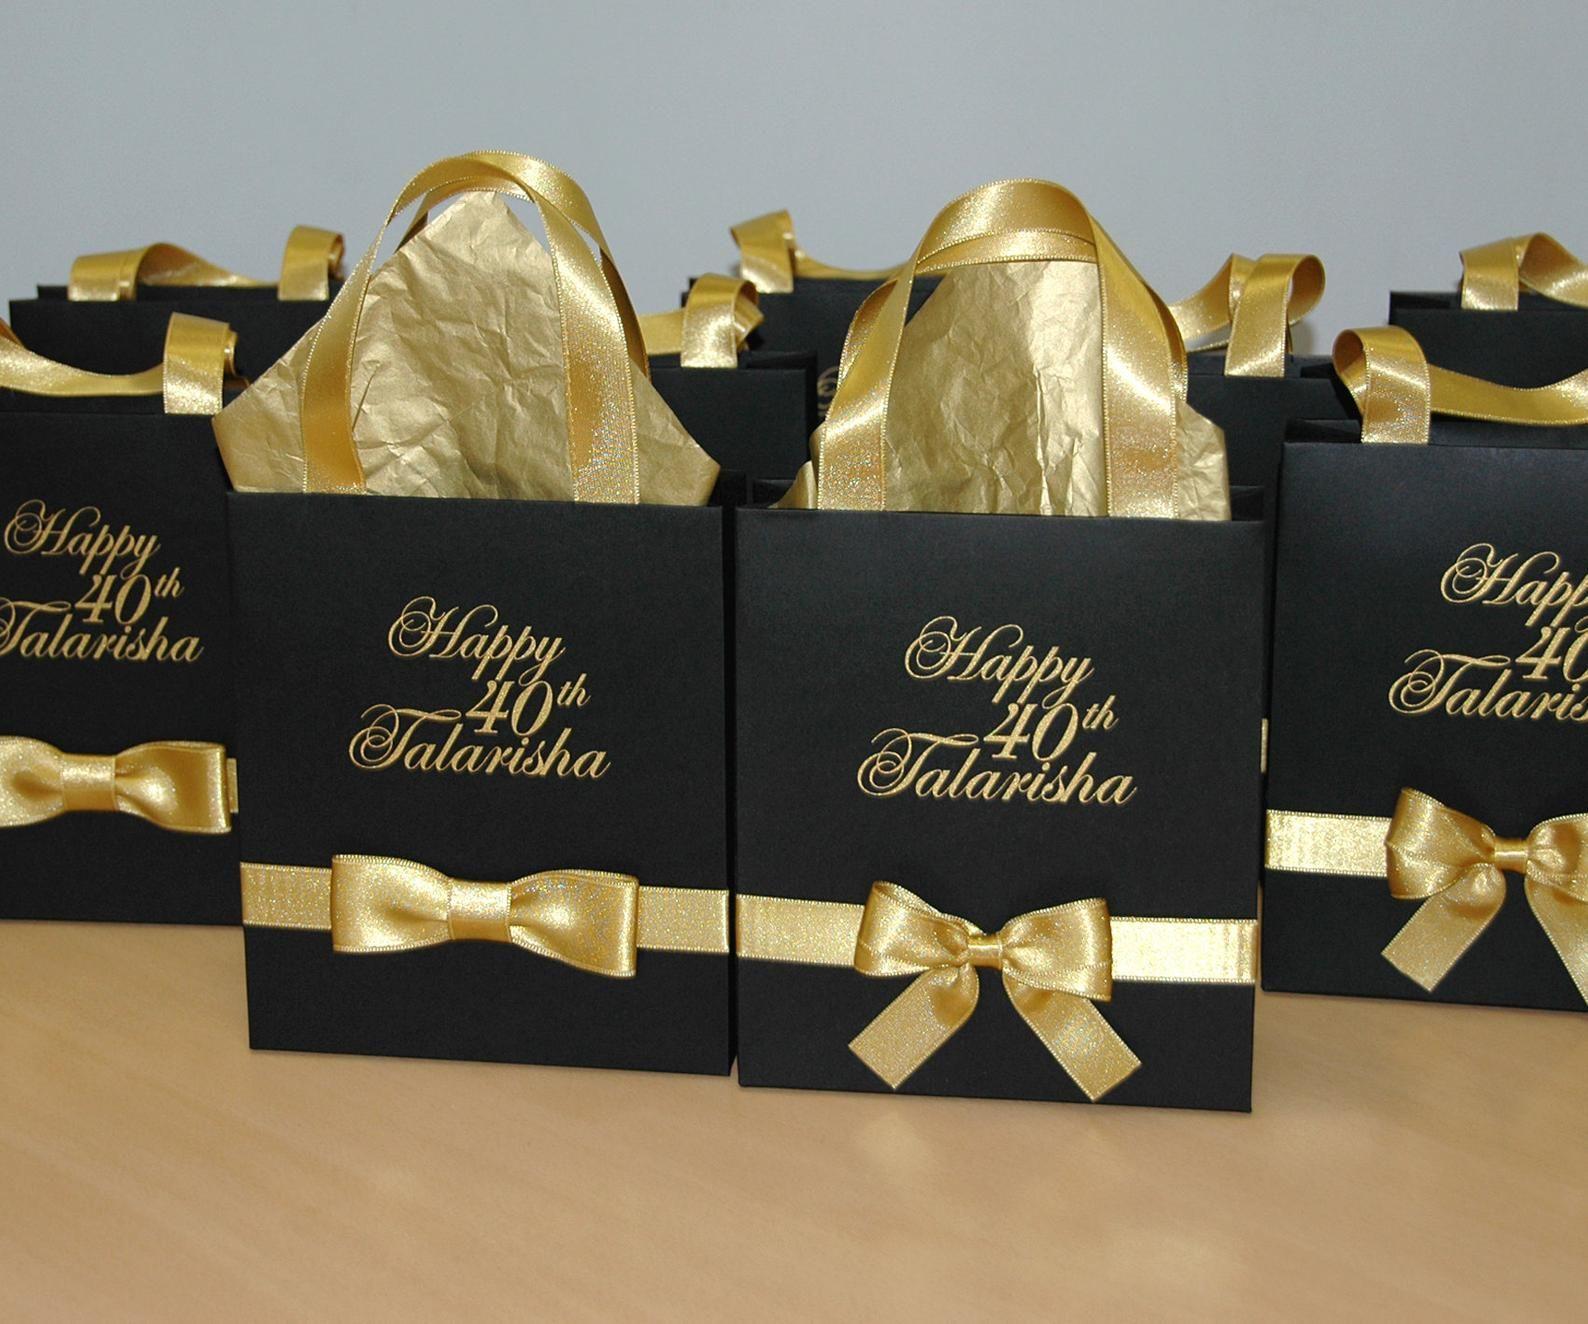 75th birthday gift ideas india